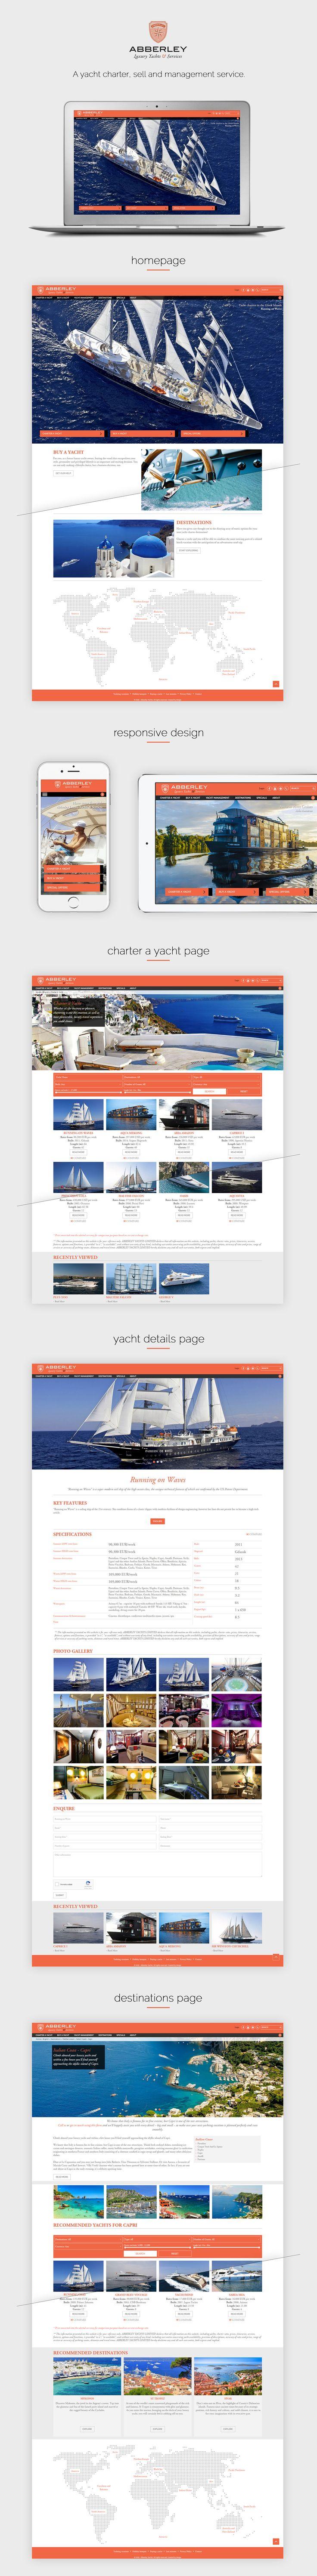 Abberley Yachts webdesign